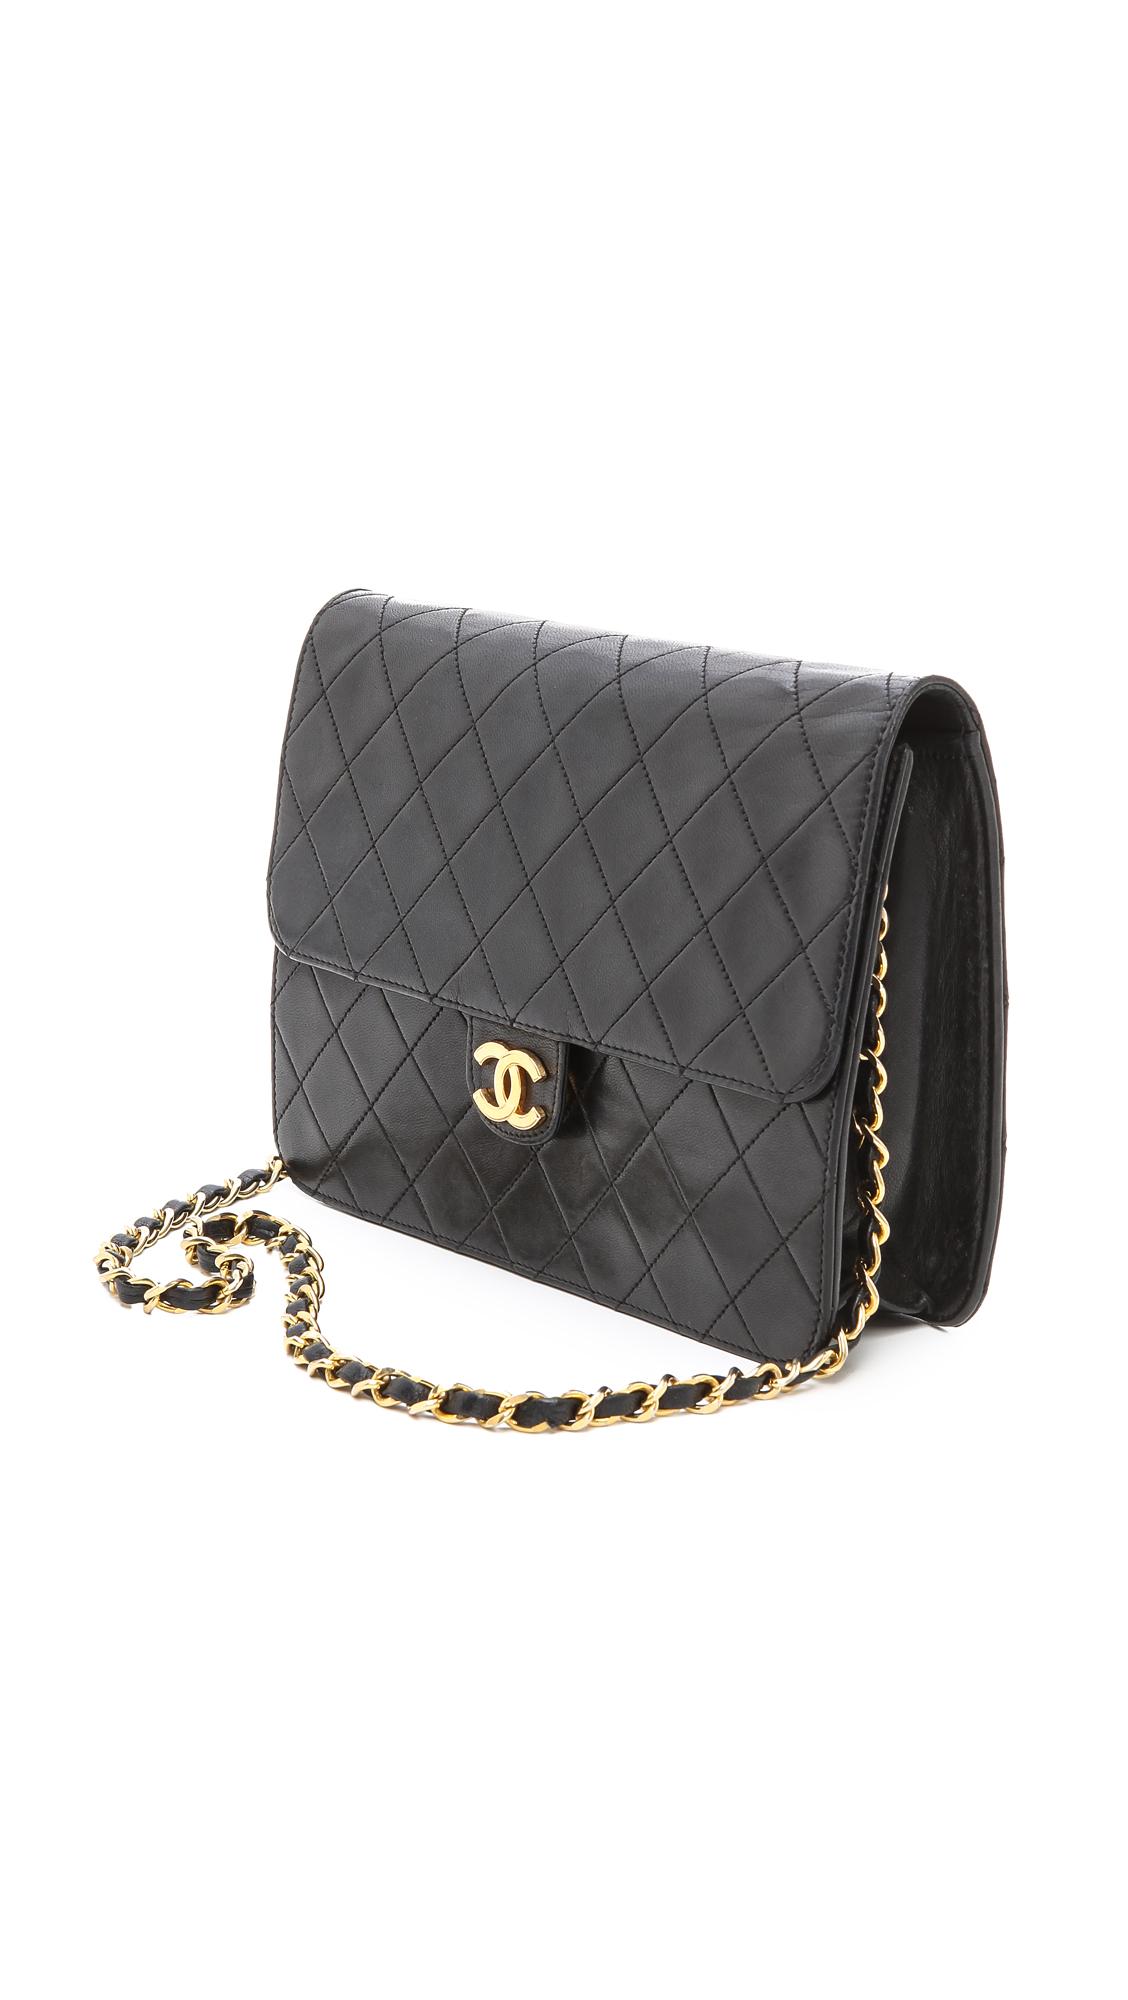 9610f868c5b0 WGACA Vintage Vintage Chanel Ex Flap Bag | SHOPBOP